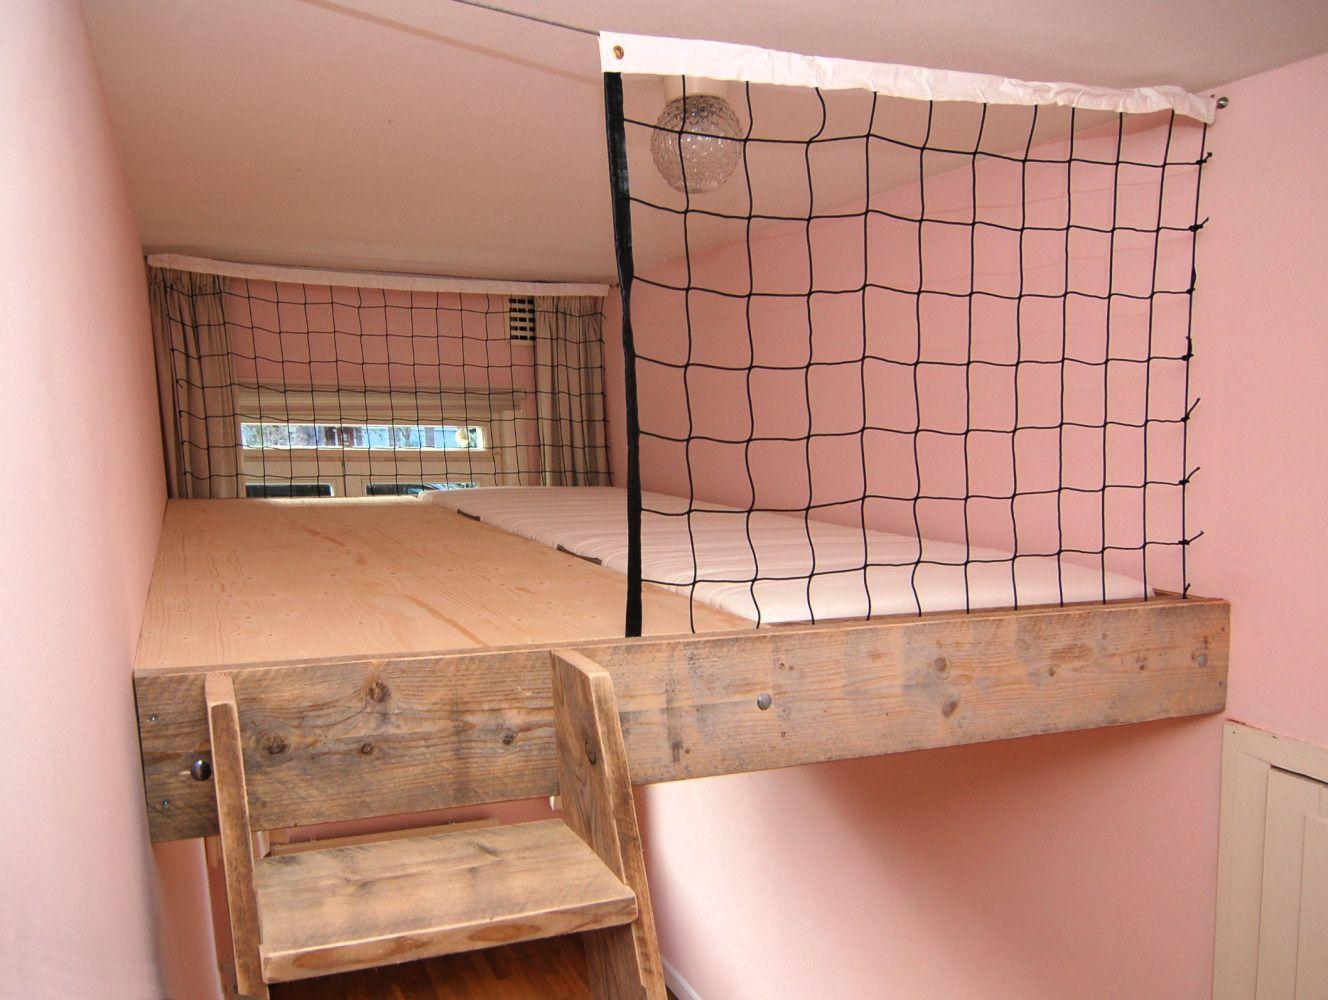 Mura mura videbedden for the home pinterest slaapkamer hoogslaper en zolder - Tiener meisje mezzanine slaapkamer ...